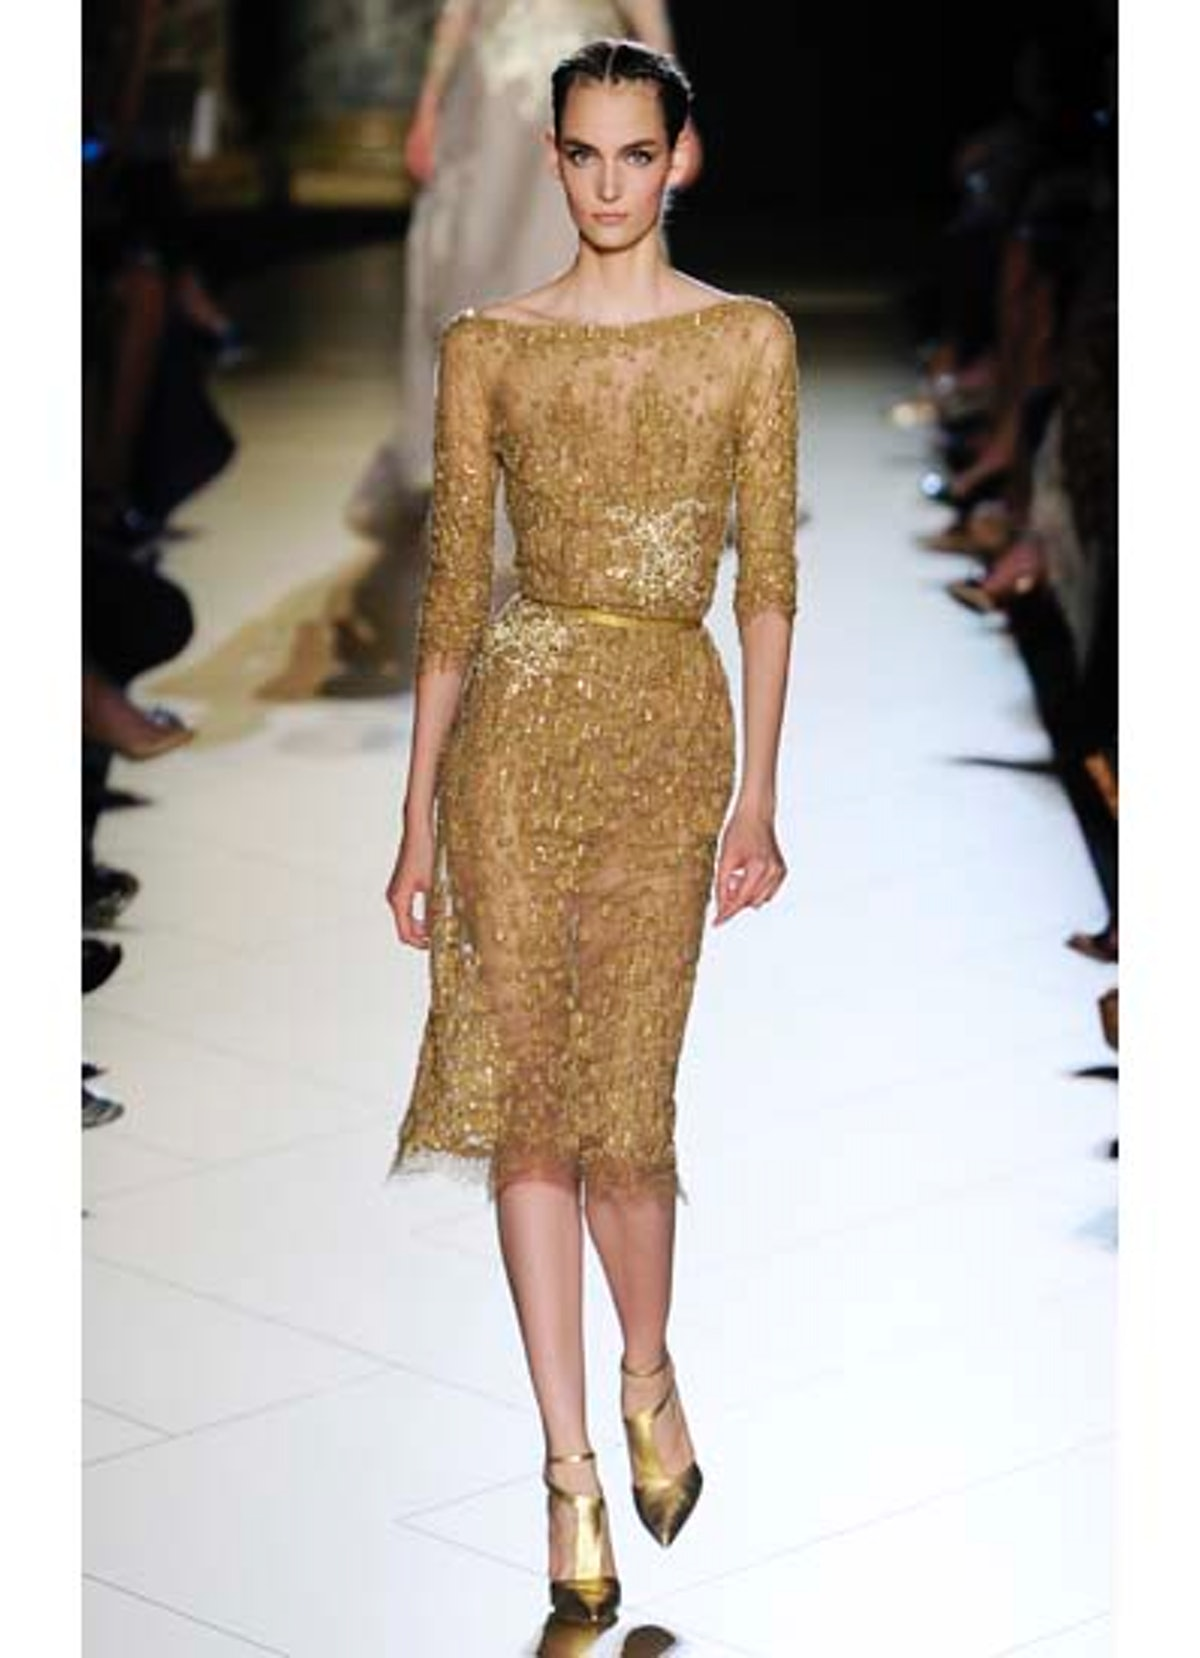 fass-elie-saab-couture-2012-runway-39-v.jpg